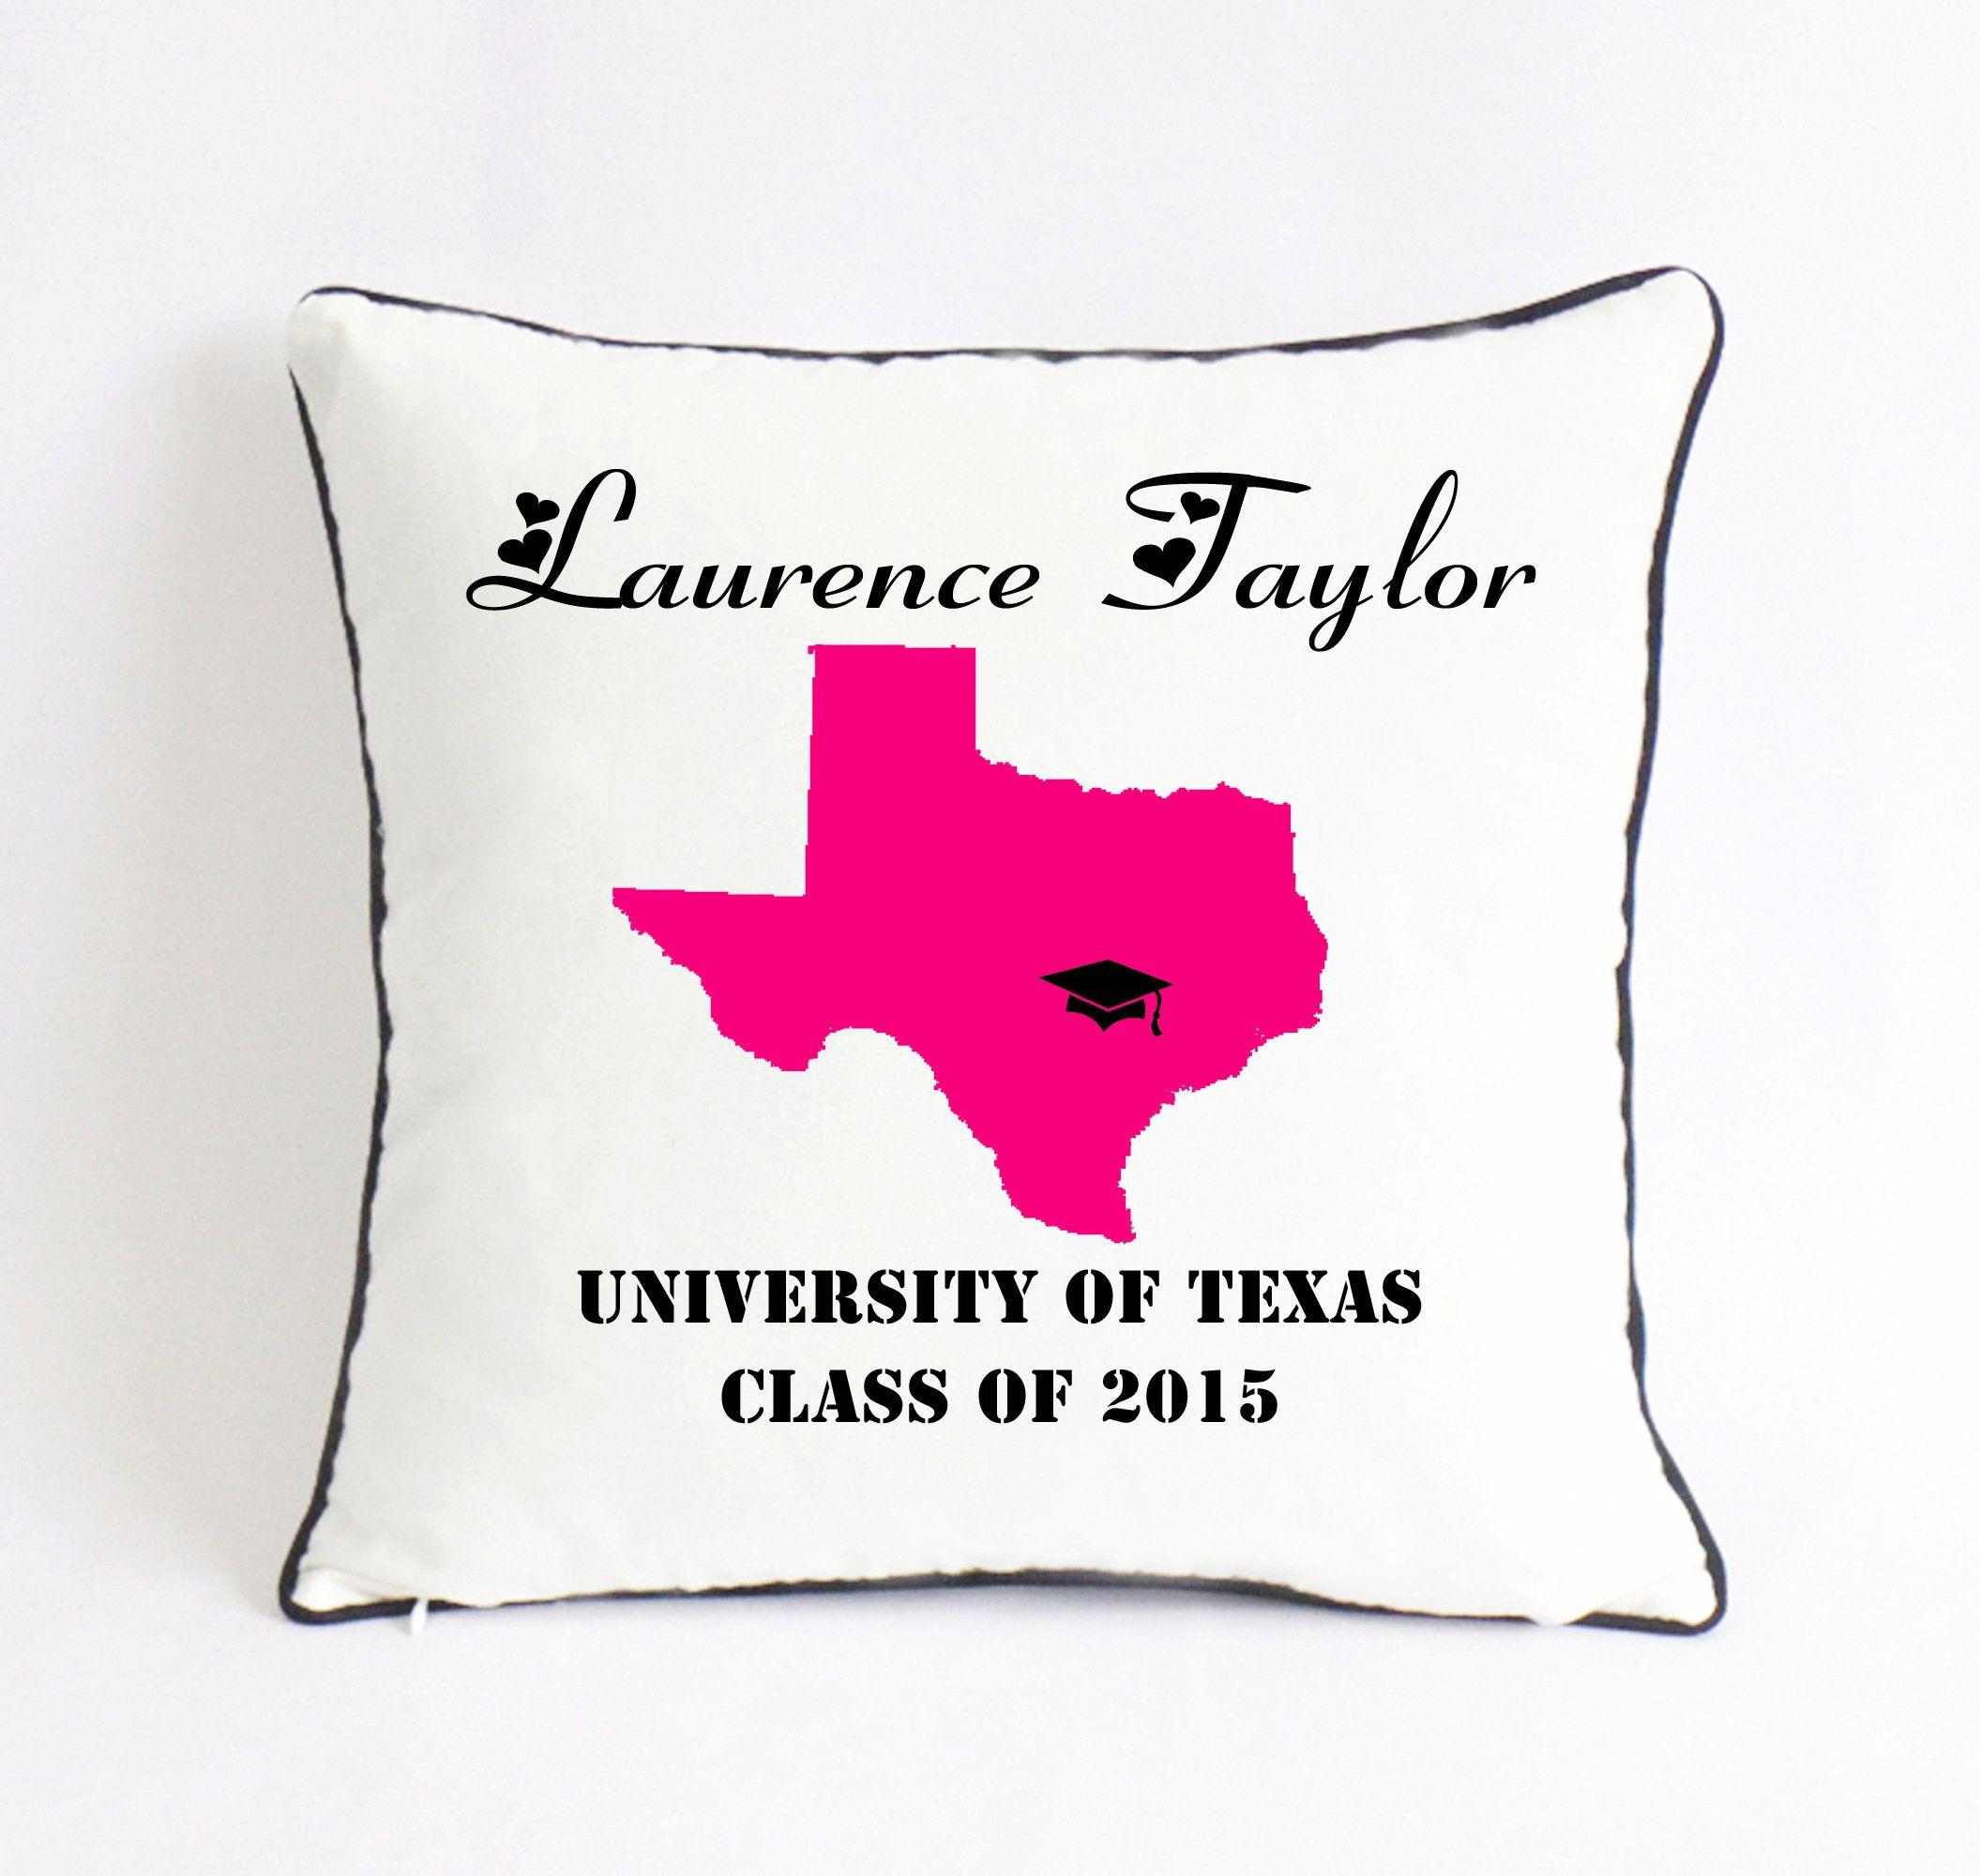 College graduation pillowgraduation party decortexas